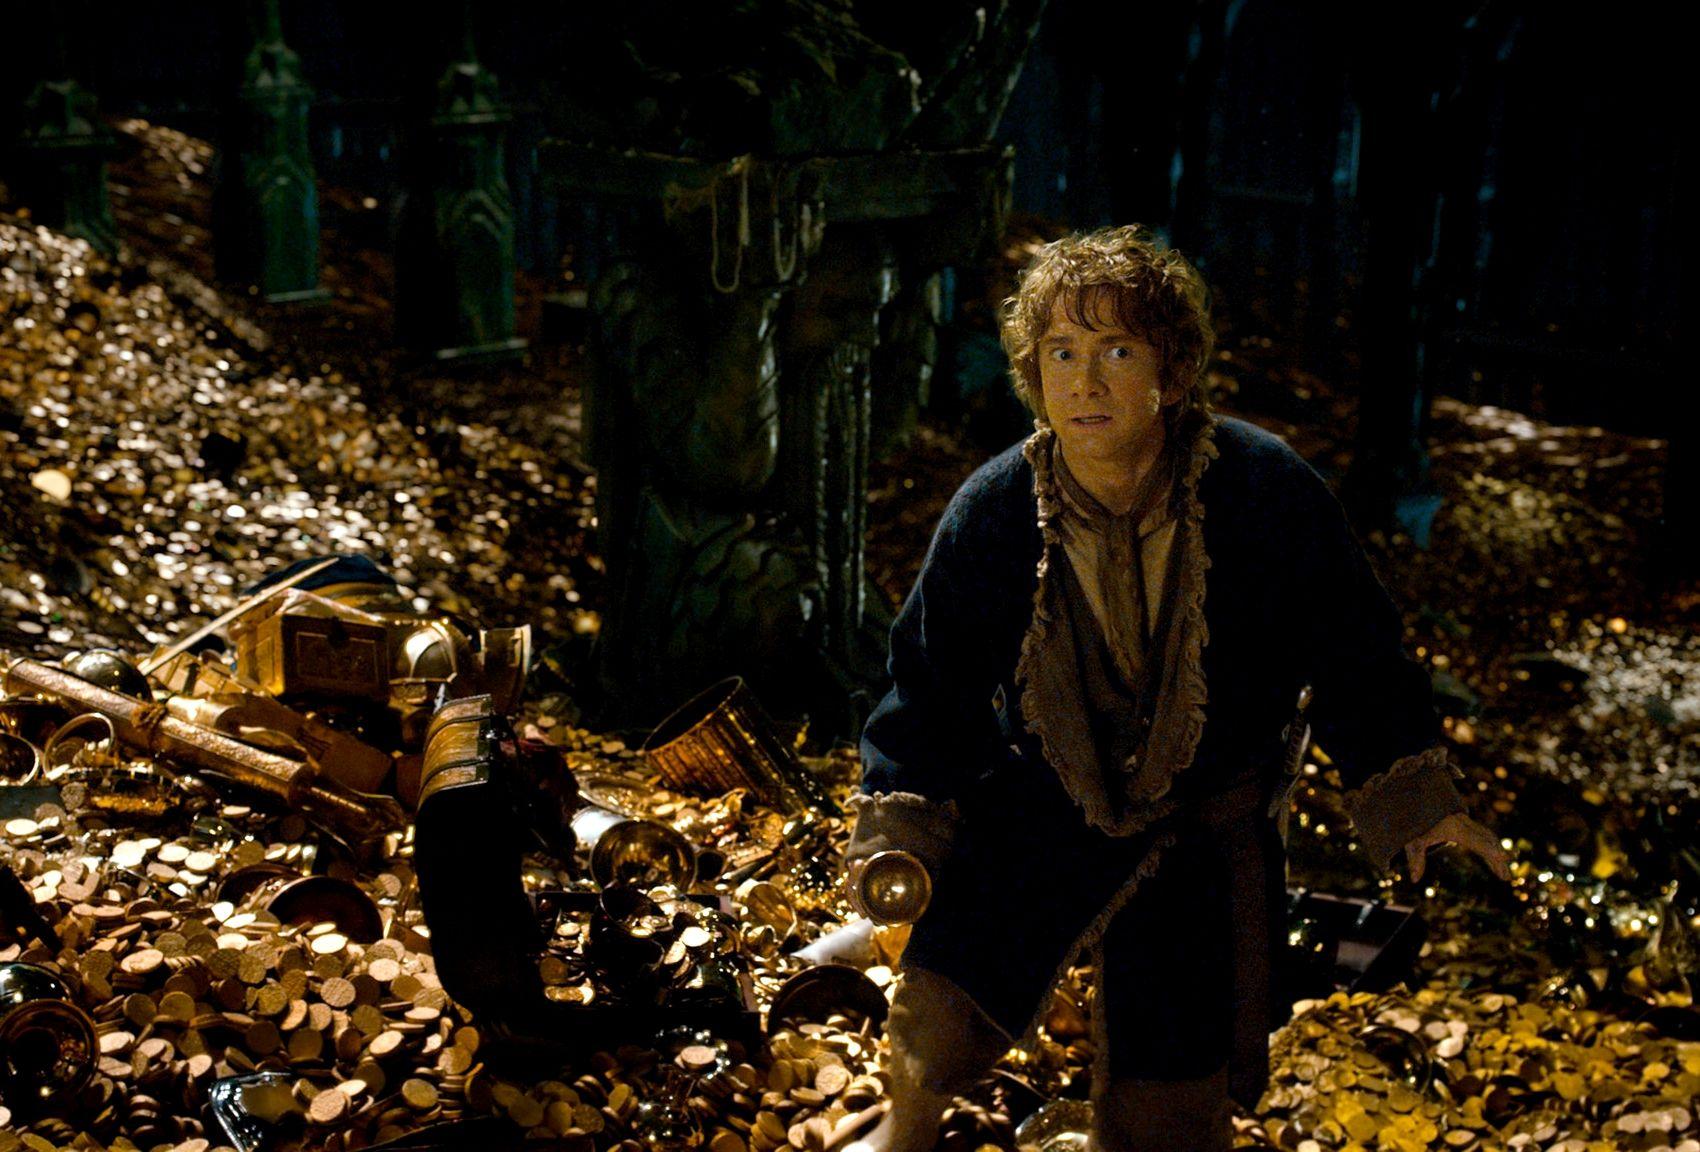 The Hobbit: The Desolation of Smaug - Movie Still